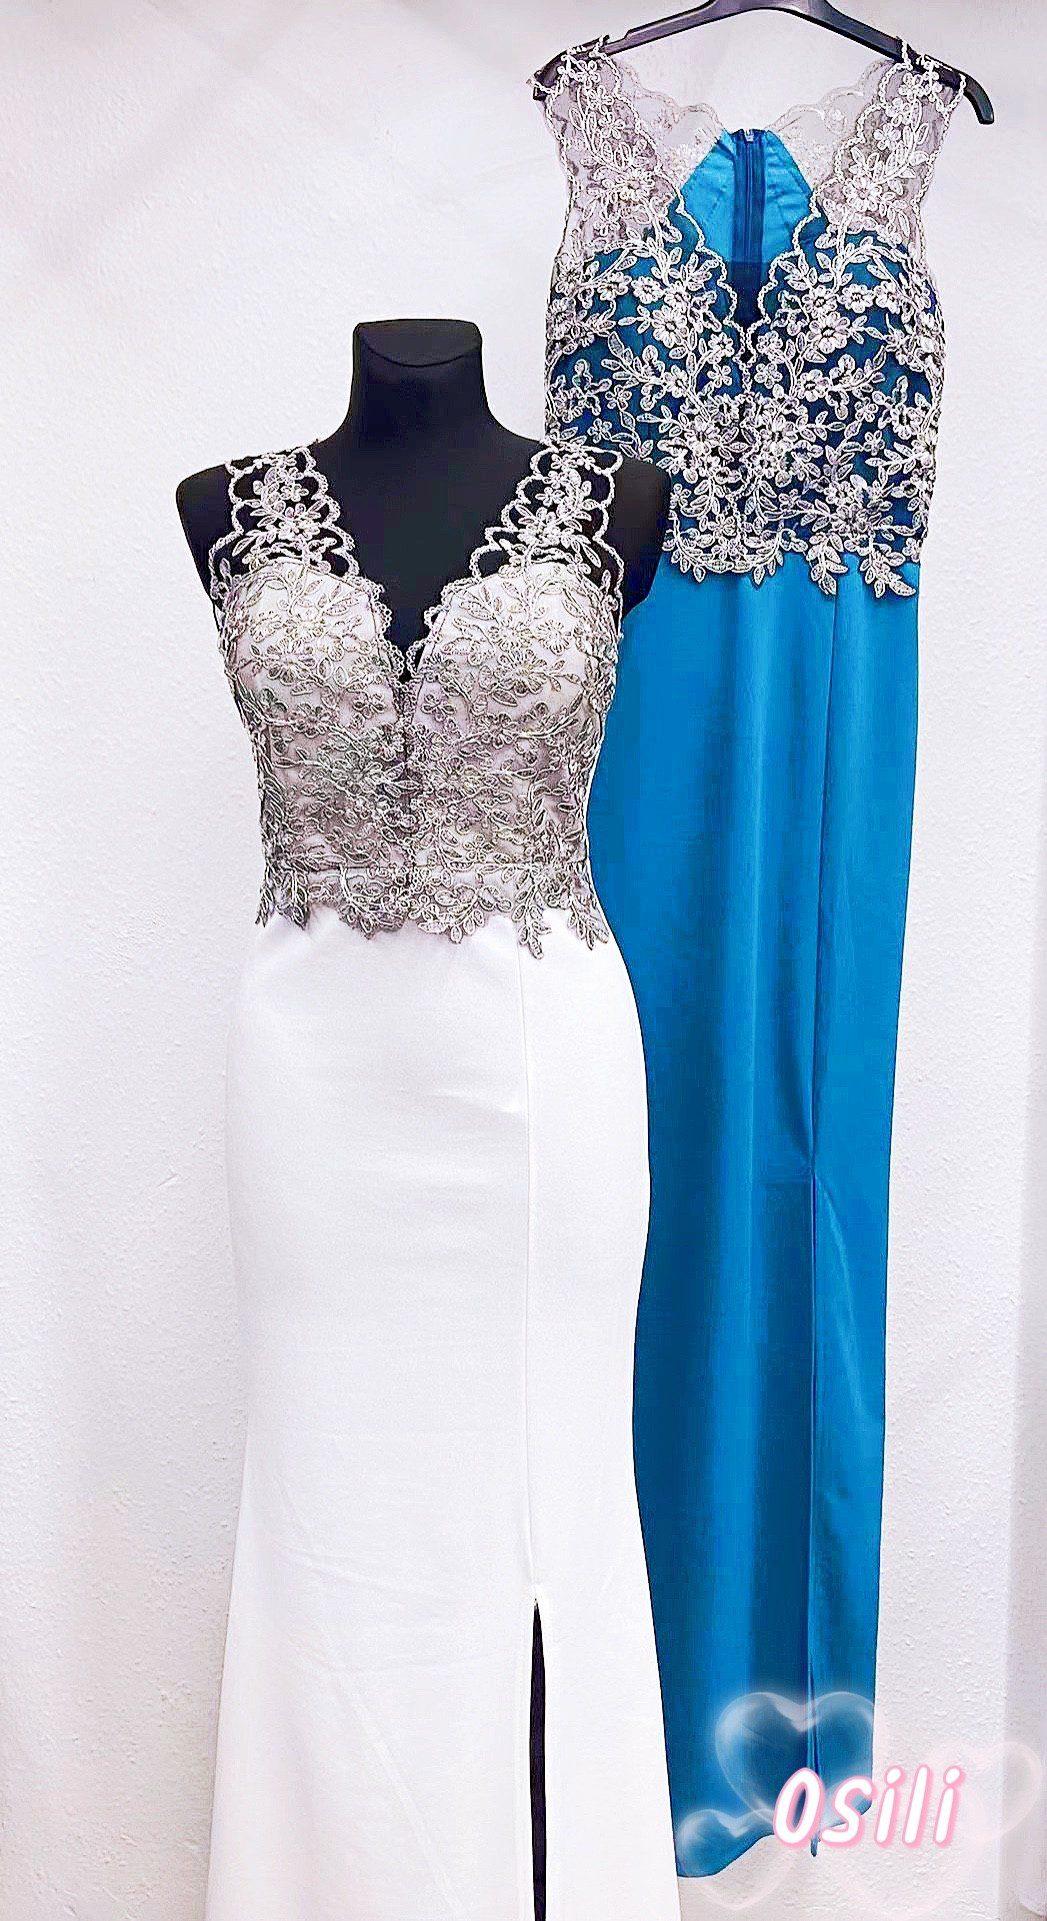 B96AC284 70D8 49A7 9975 96929D8D5983 Osili - Fashion - Divat